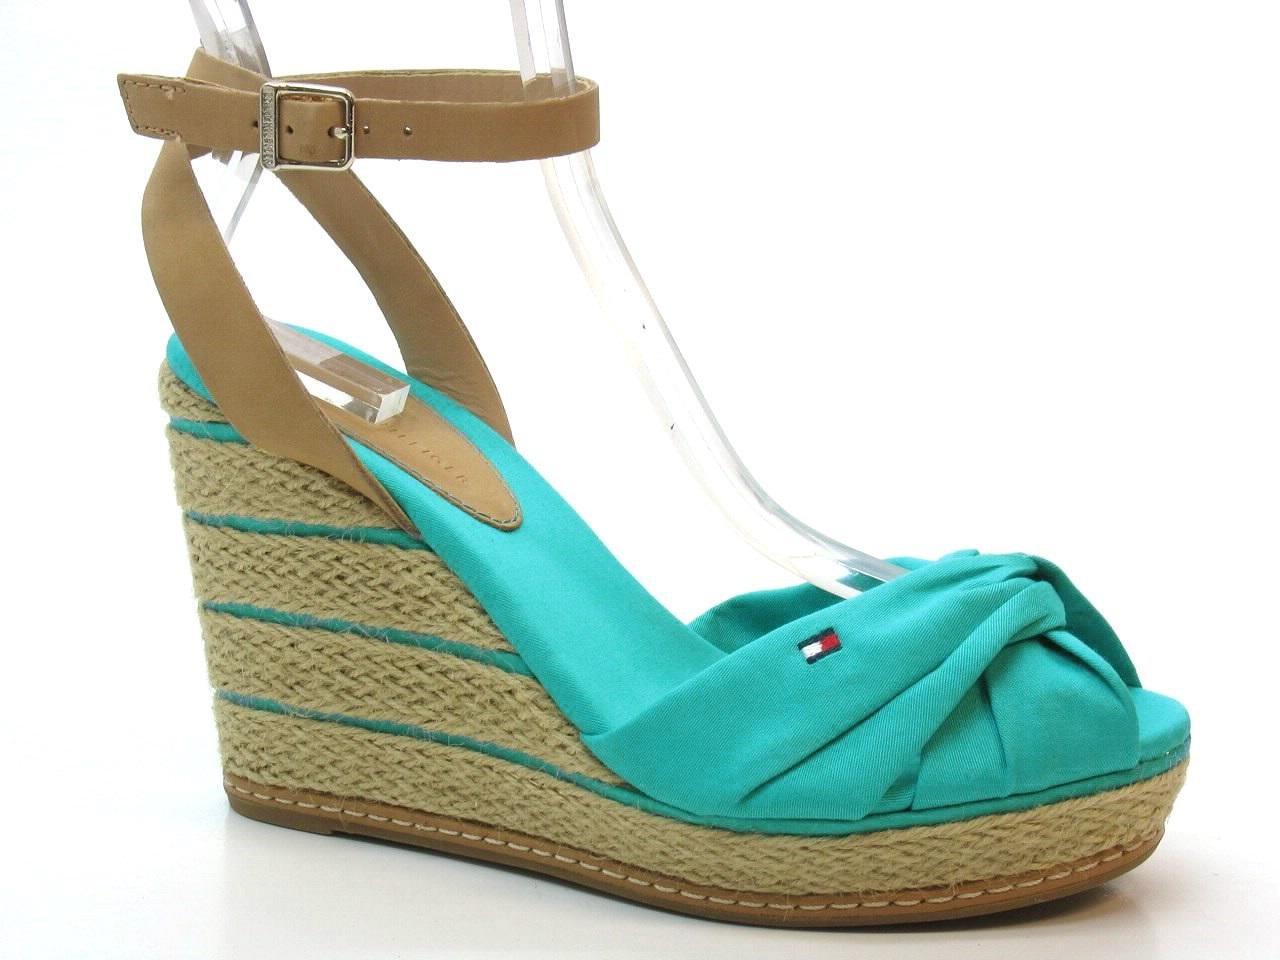 Wedge Sandals Tommy Hilfiger - 309 16769